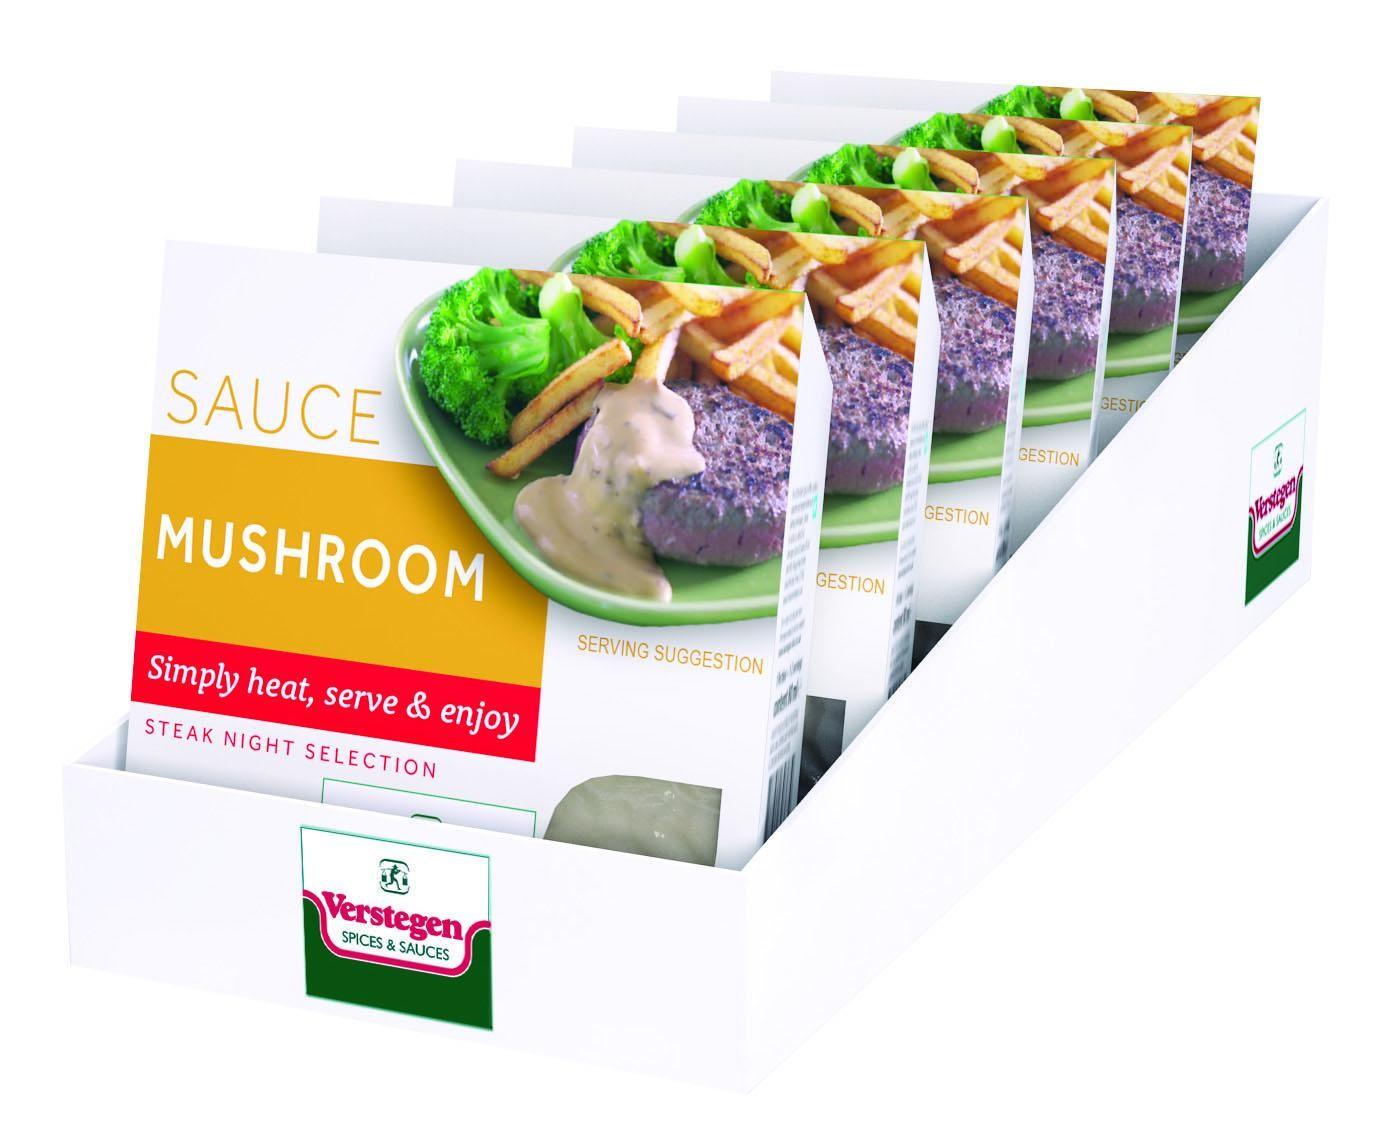 MUSHROOM - VERSTAGEN MICRO SAUCE